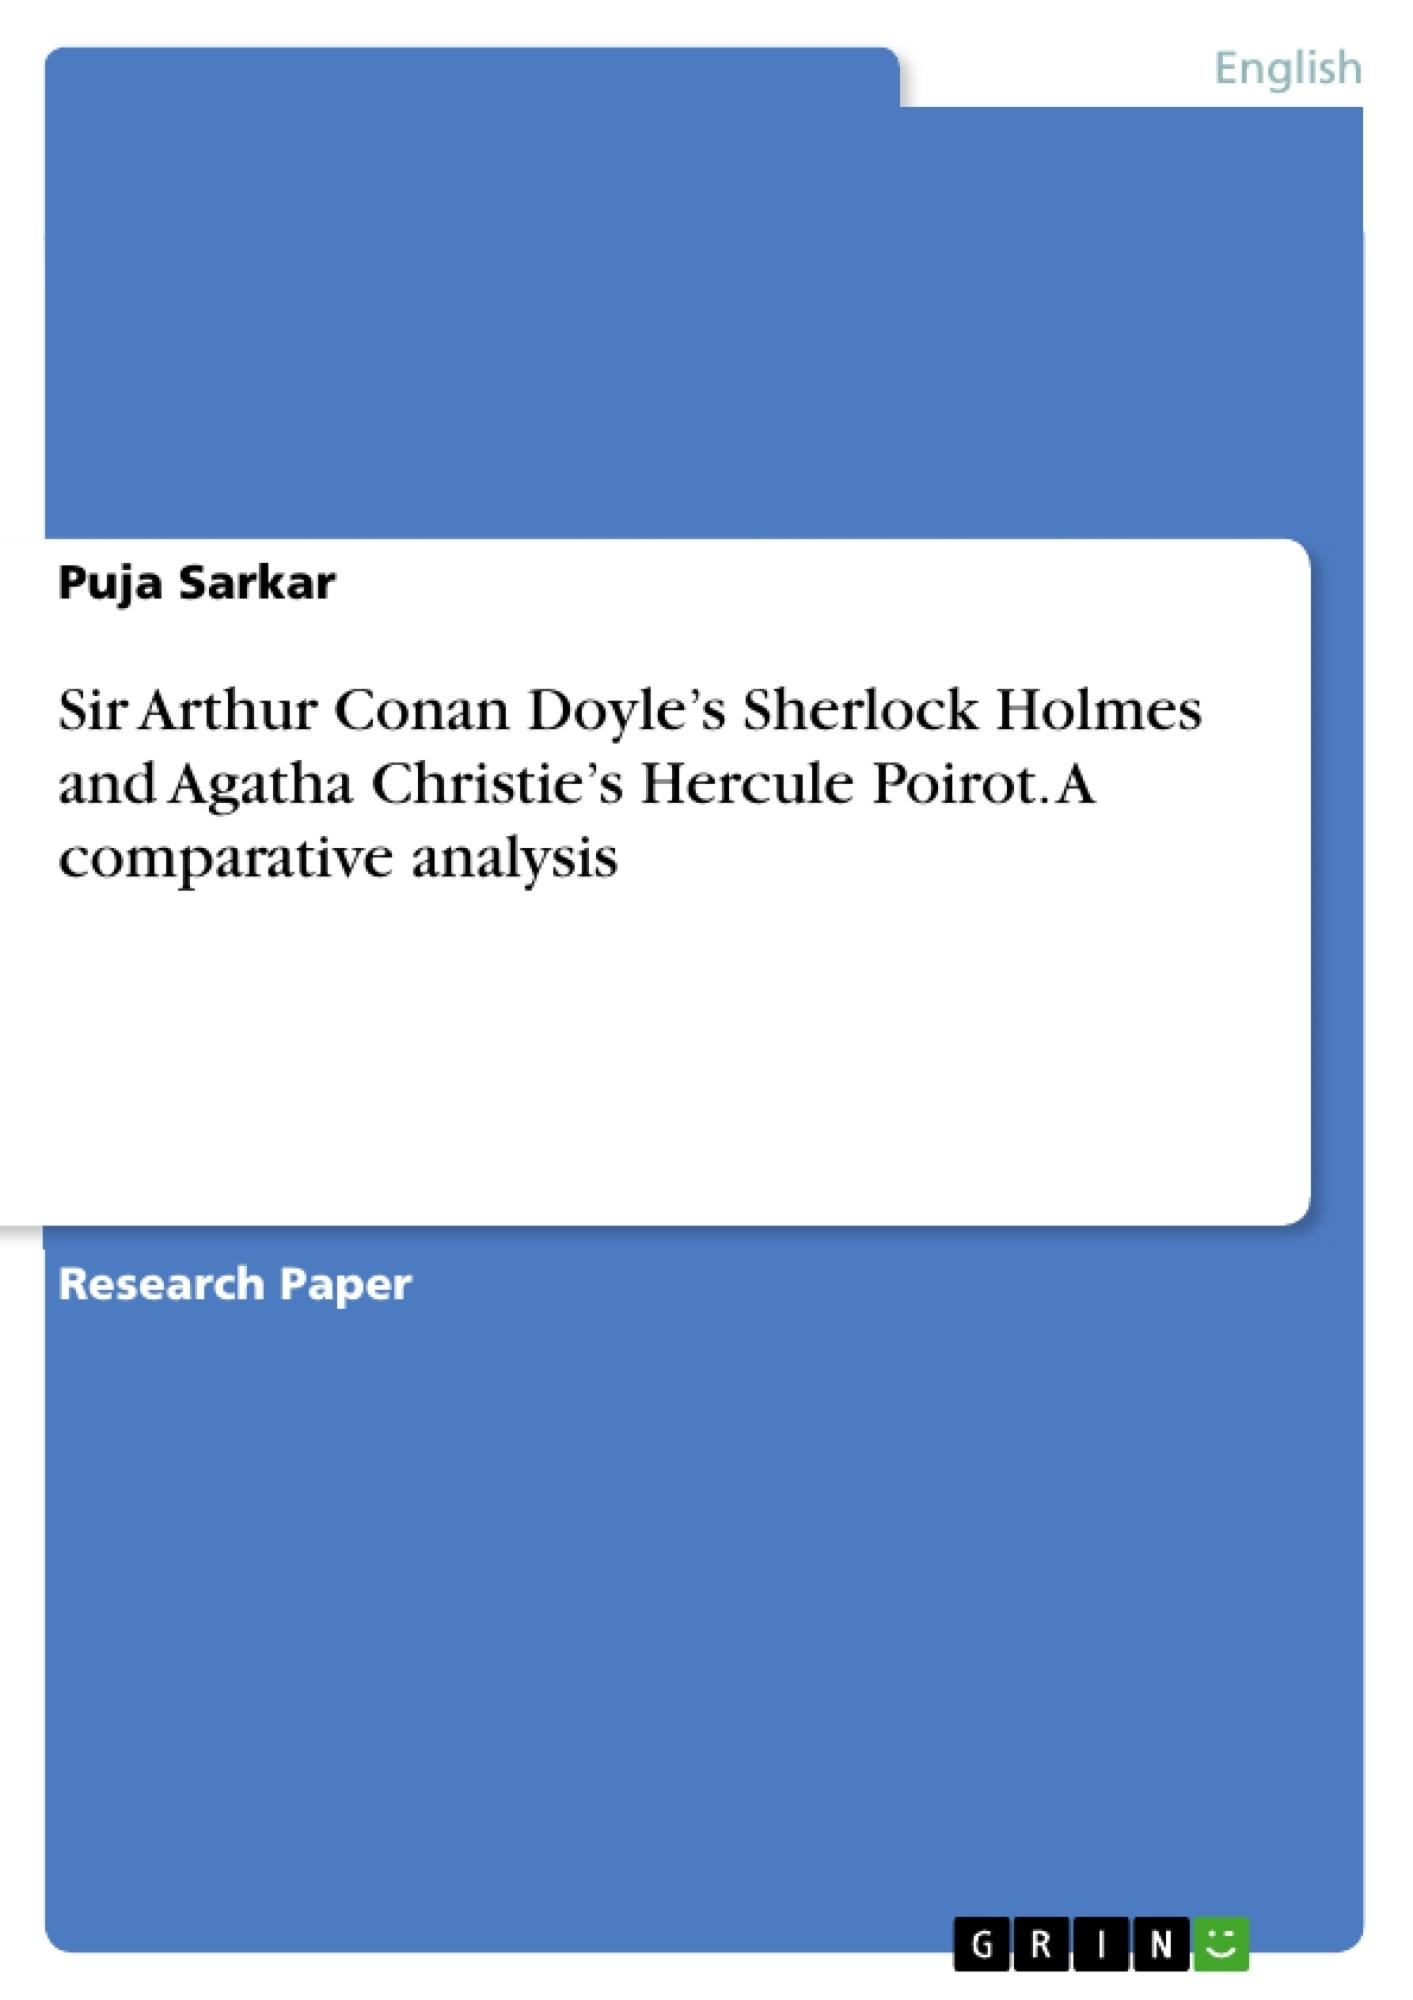 Title: Sir Arthur Conan Doyle's Sherlock Holmes and Agatha Christie's Hercule Poirot. A comparative analysis